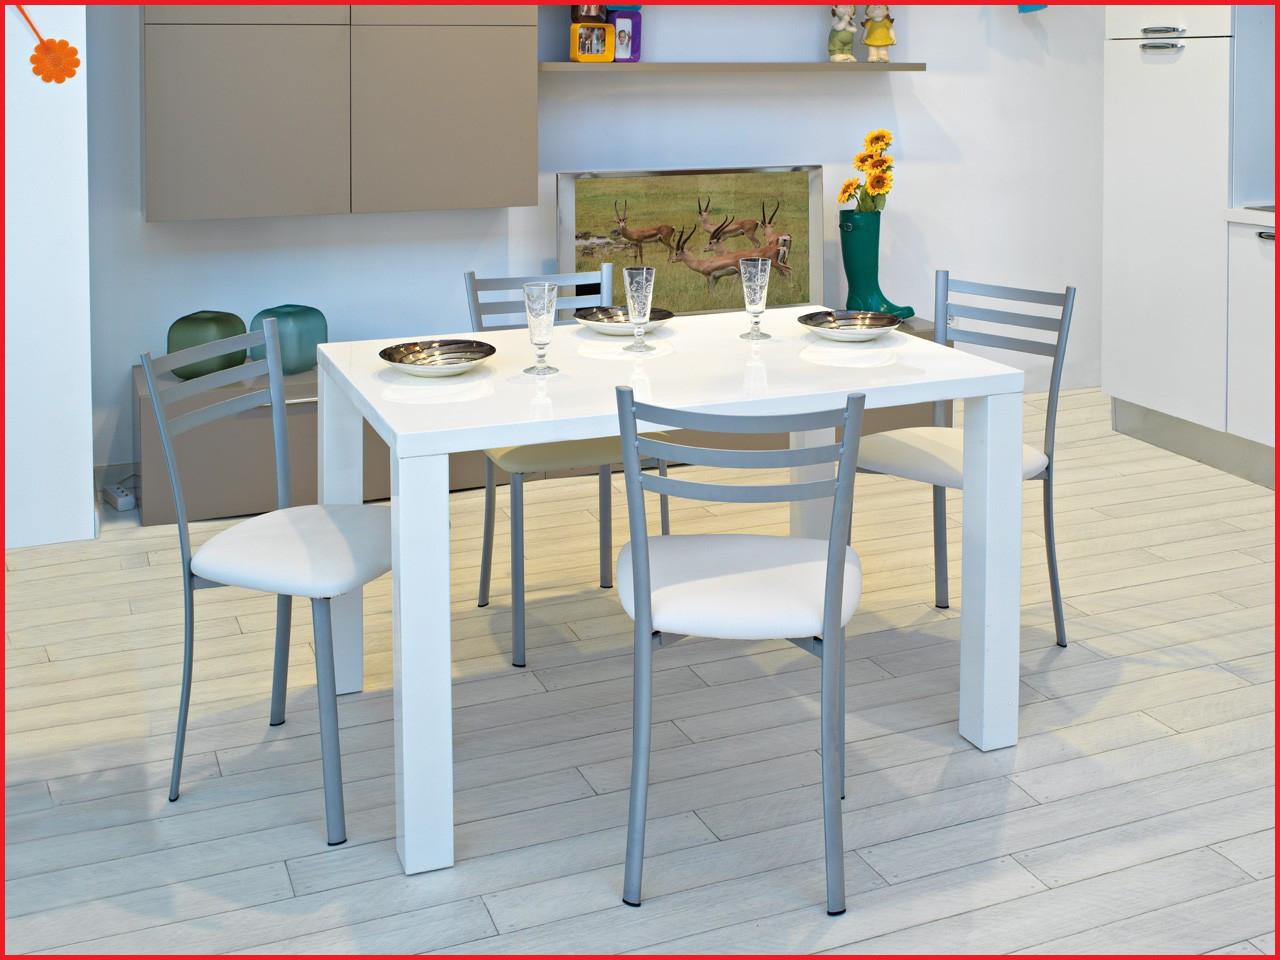 Mesas De Cocina Extensibles Baratas Budm Mesa Cocina Cuadrada Mesas De Cocina Baratas Y Mesas De